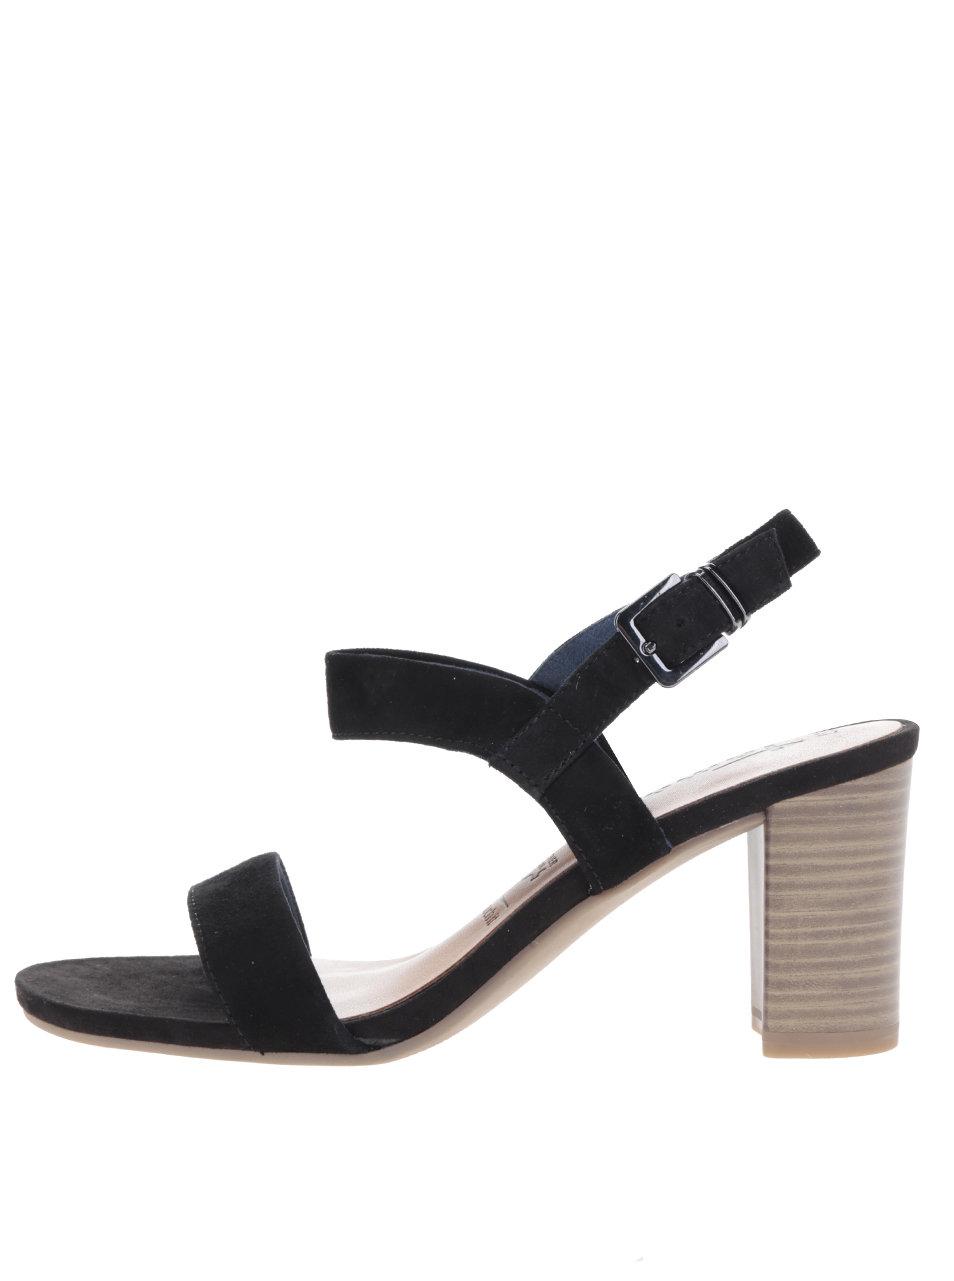 Černé páskové semišové sandálky na podpatku Tamaris ... e9ee2c48df